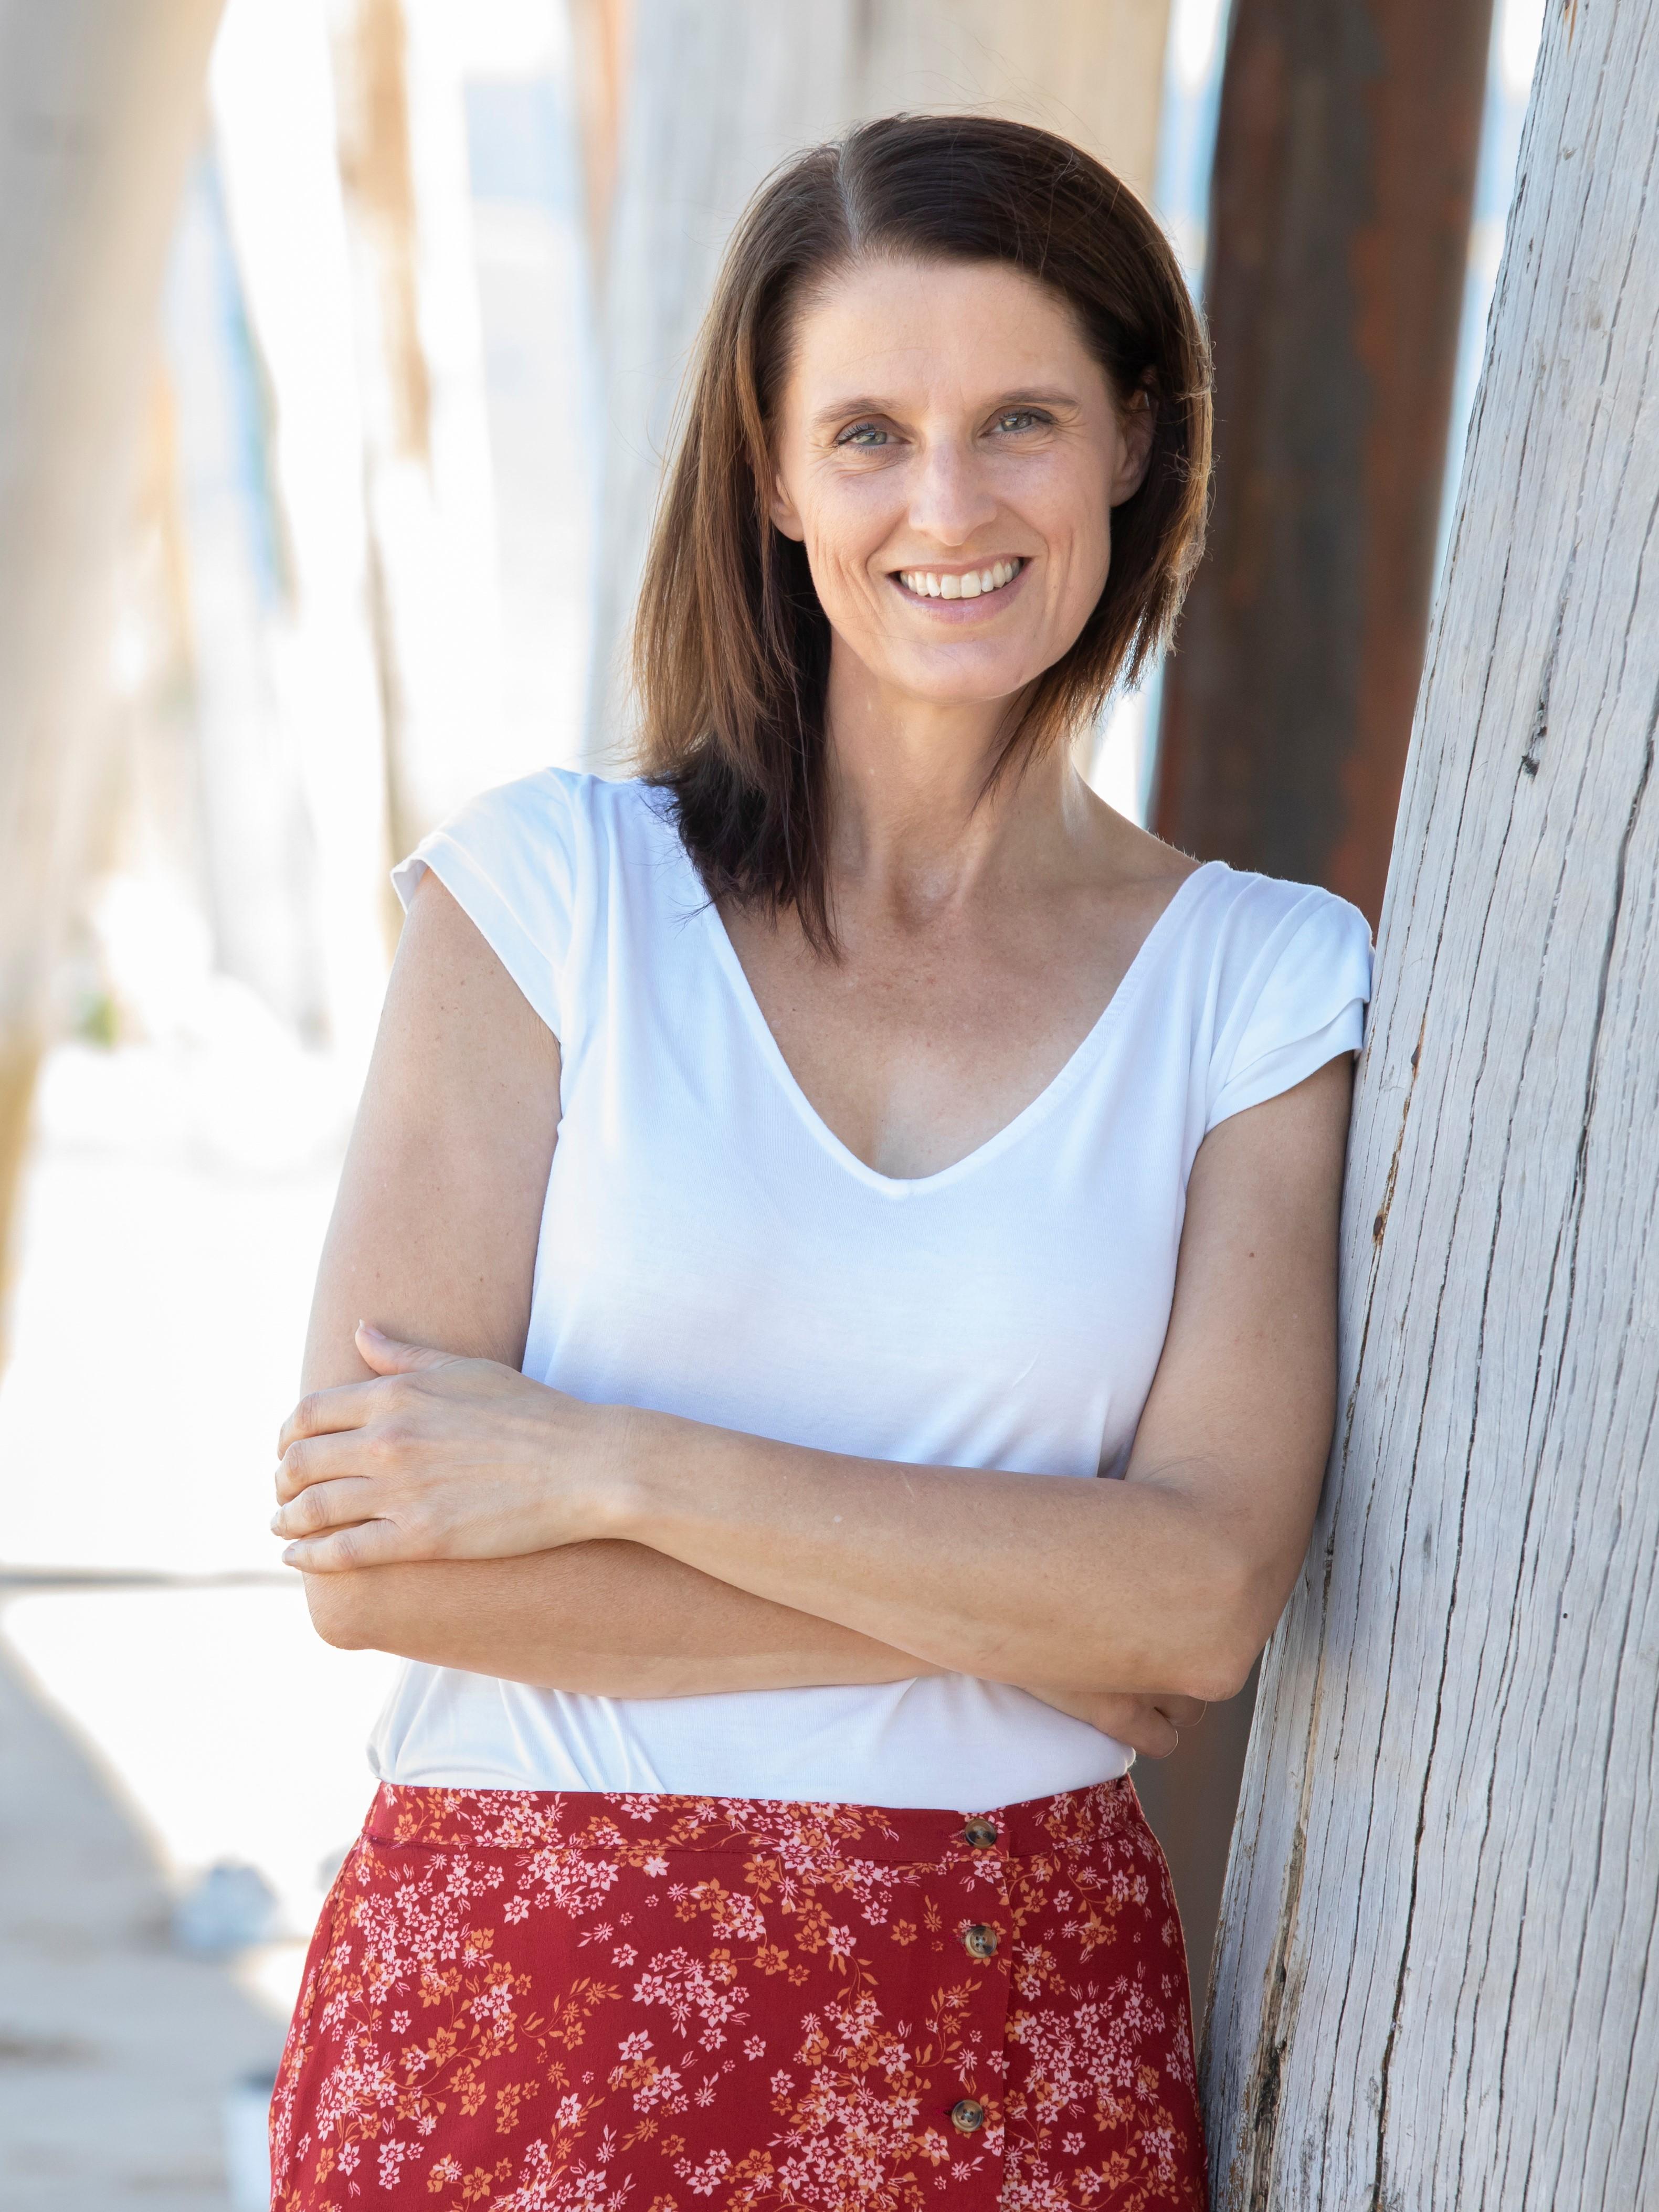 Mandy Neller of Soul Flourish